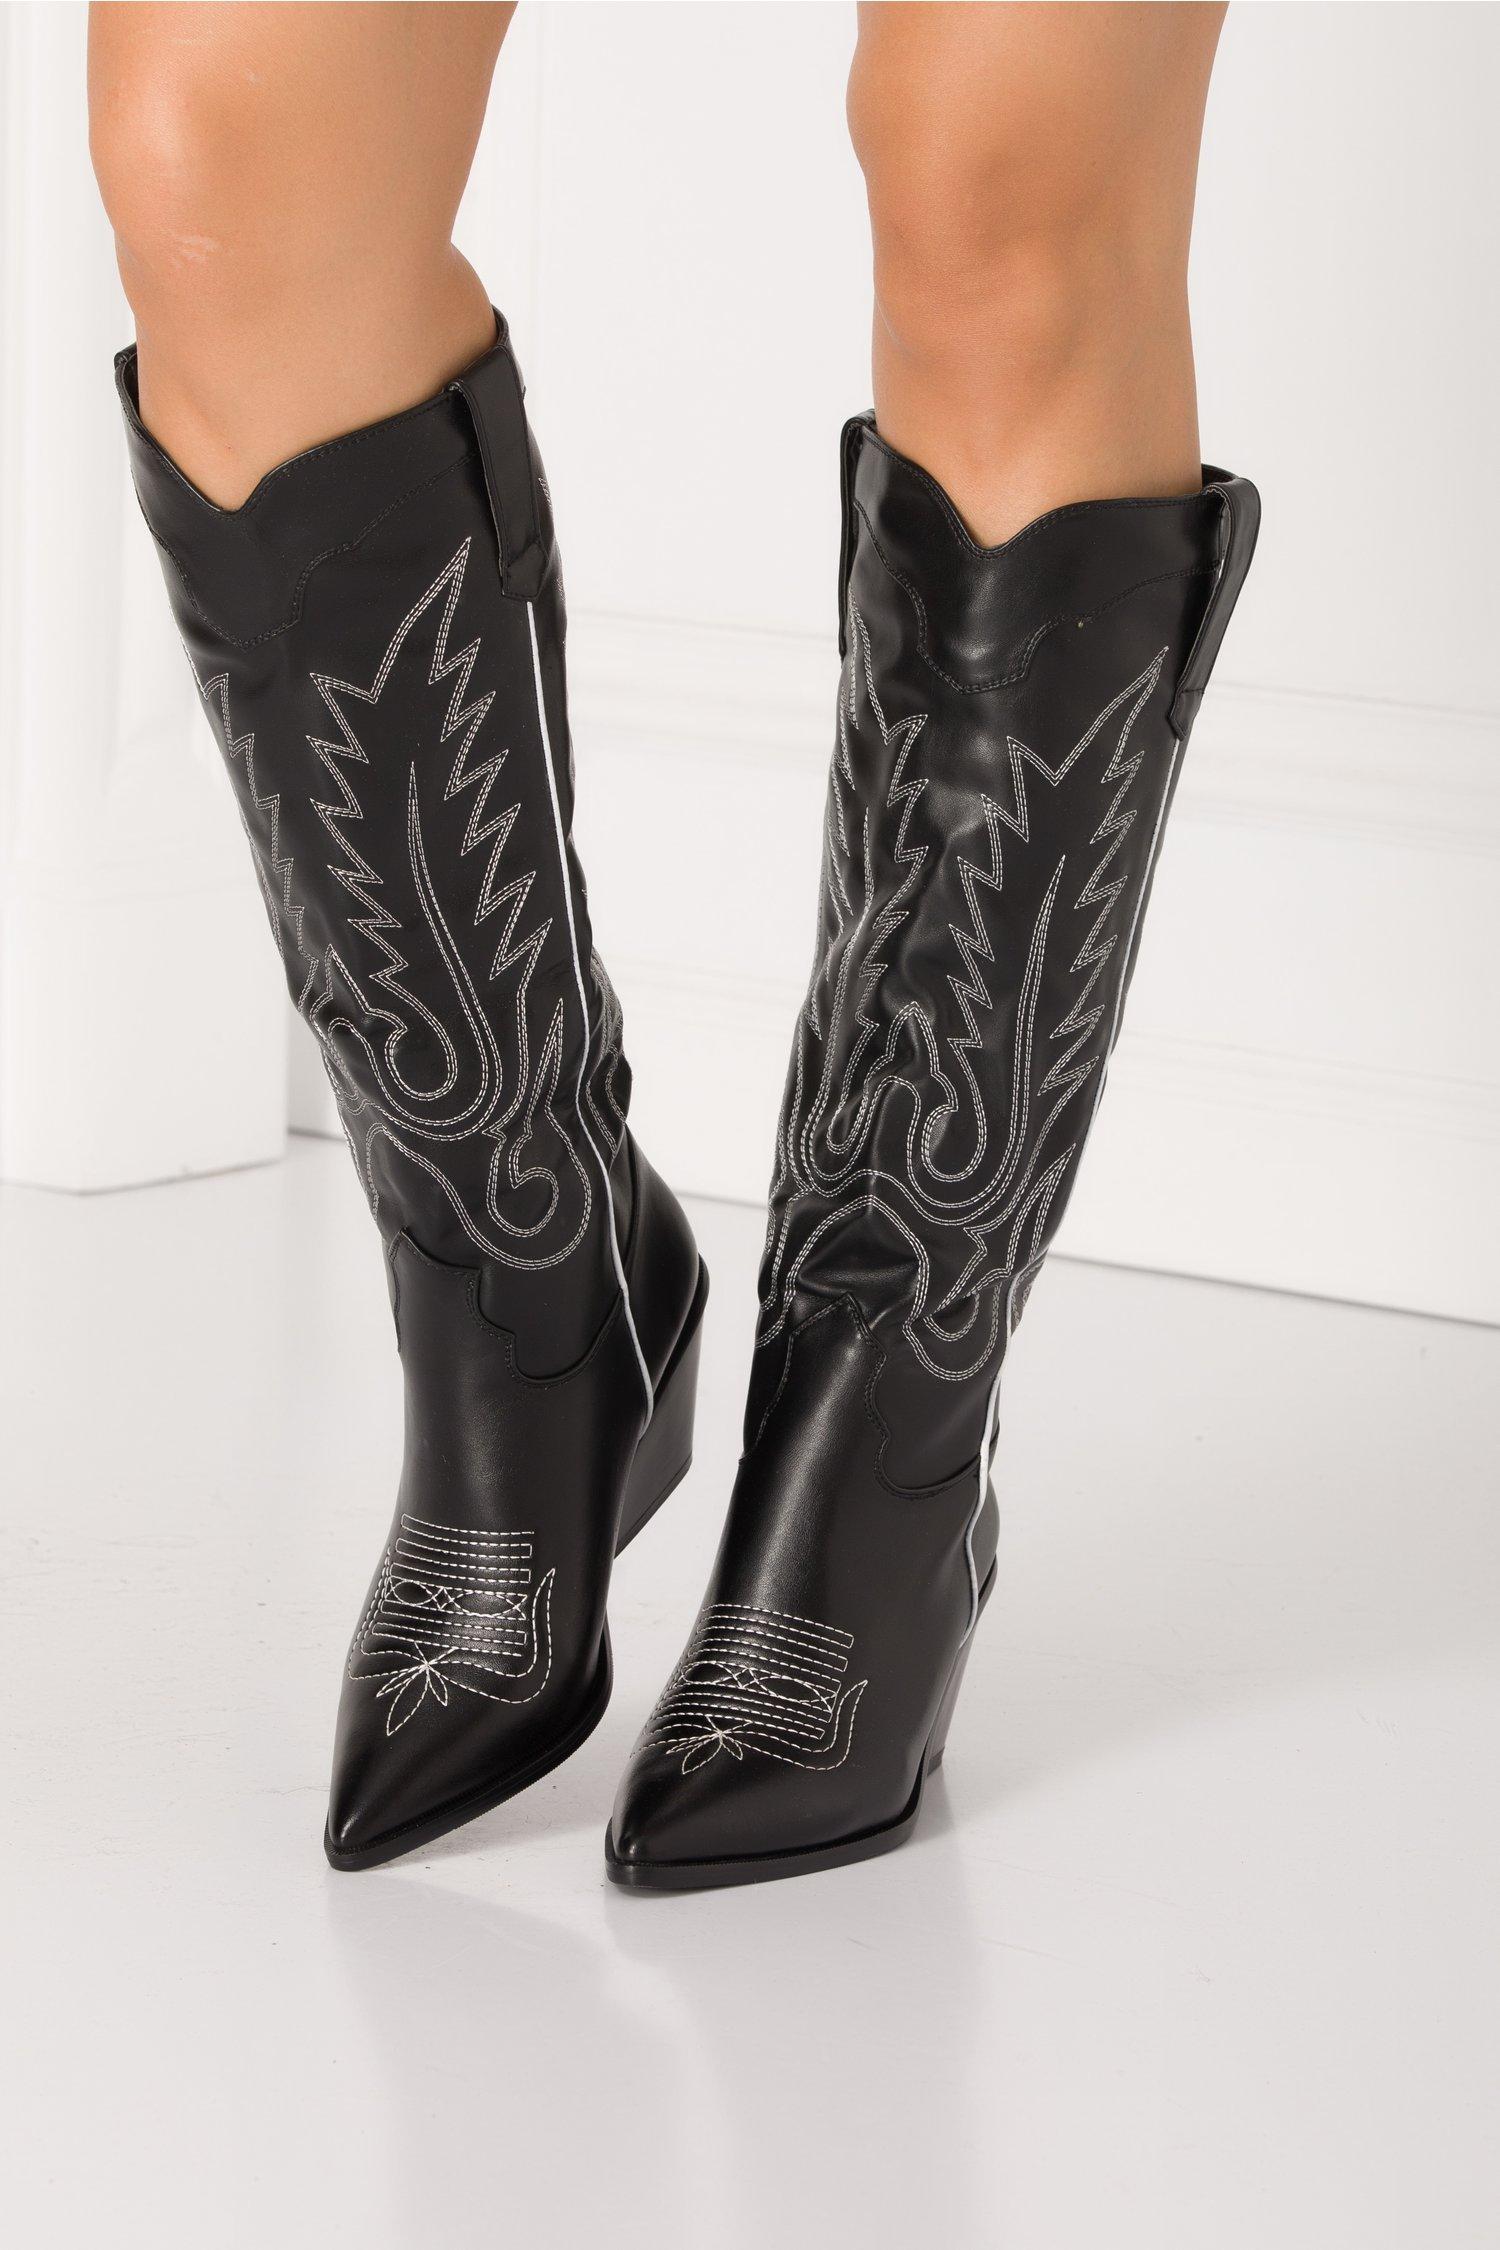 Cizme negre lungi stil ciocata cu cusaturi decorative albe